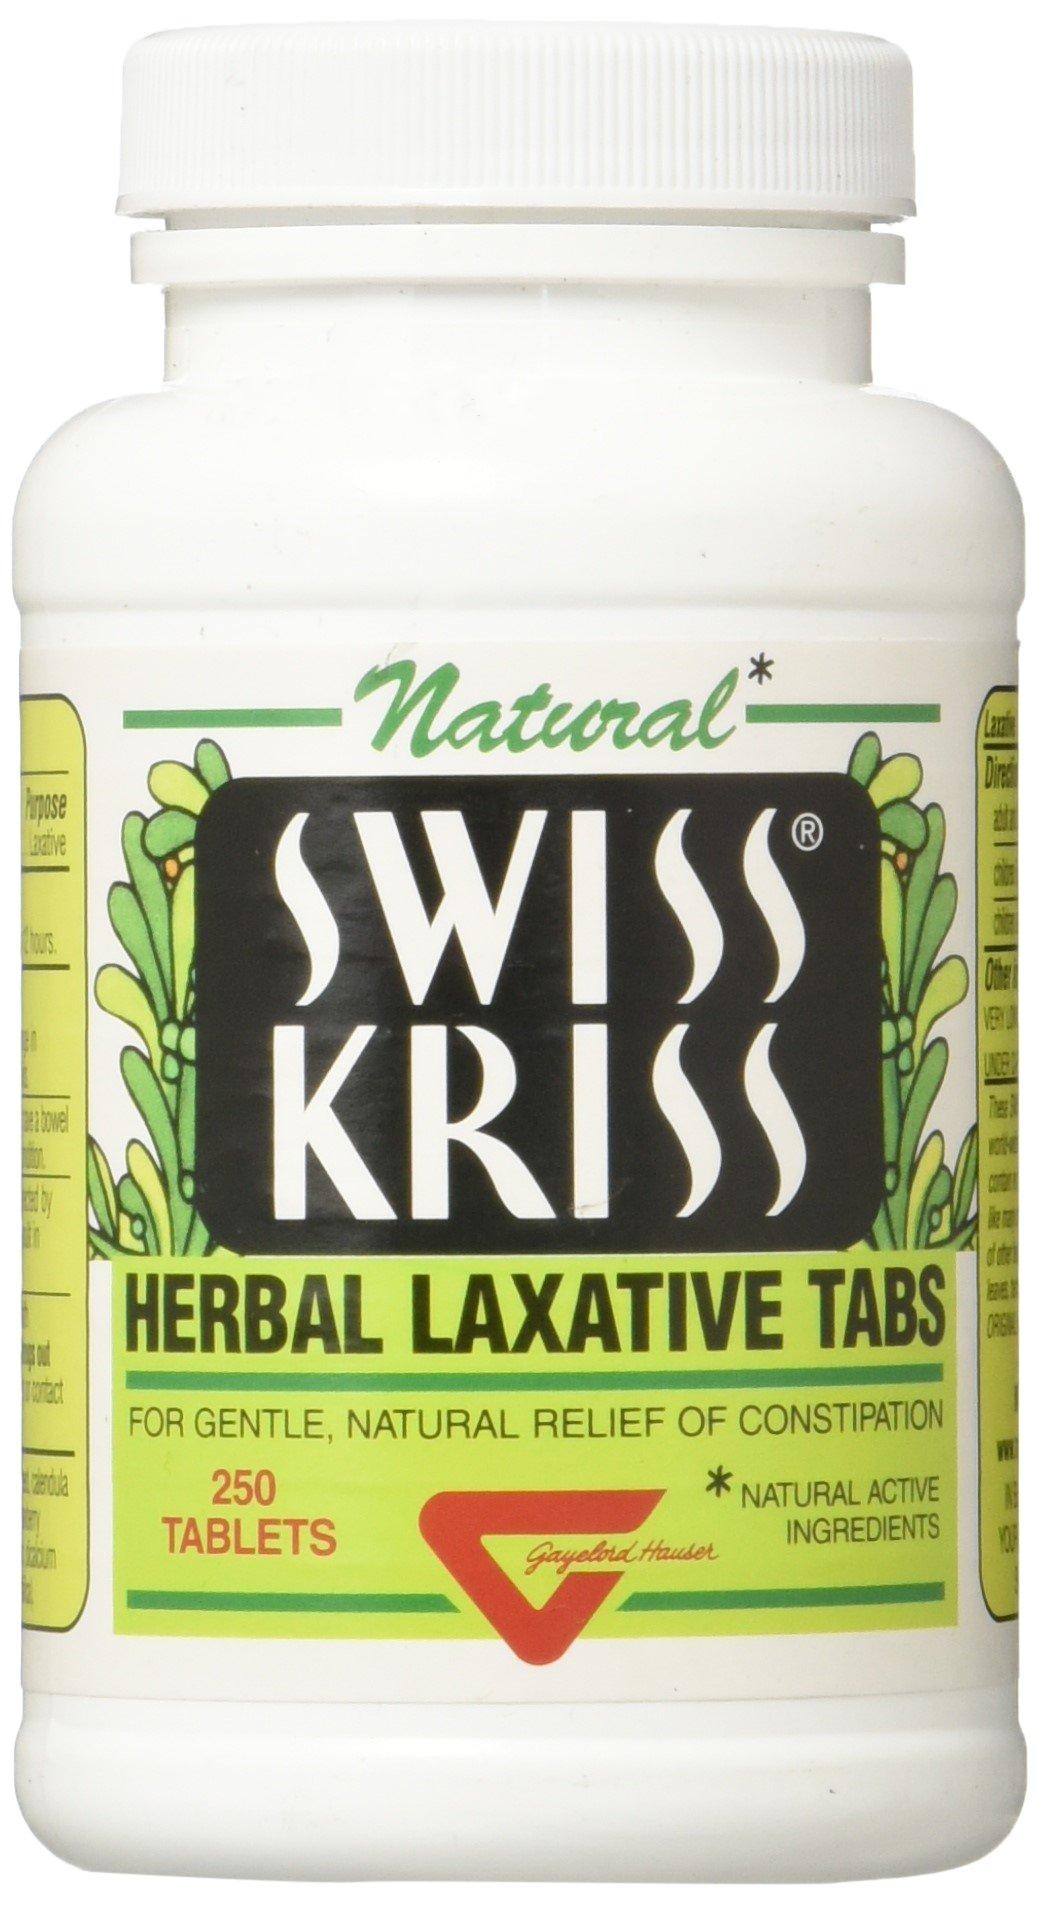 Swiss Kriss Herbal Laxative 250 Tablets 4-Pack by Swiss Kriss